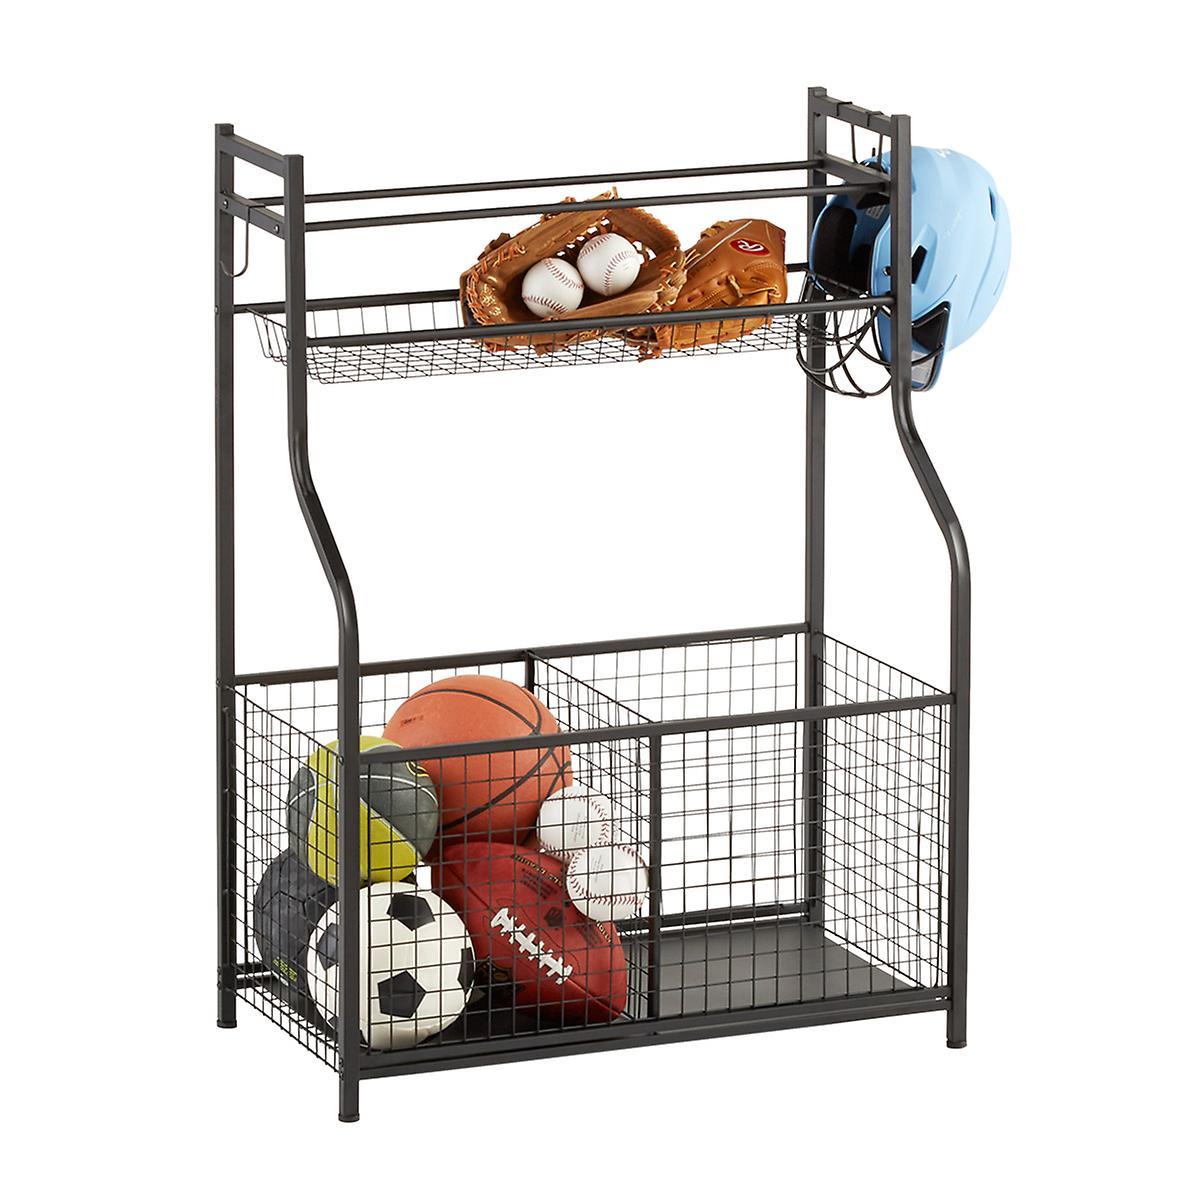 Garage Sports Organizer: Heavy-Duty Sports Storage Rack